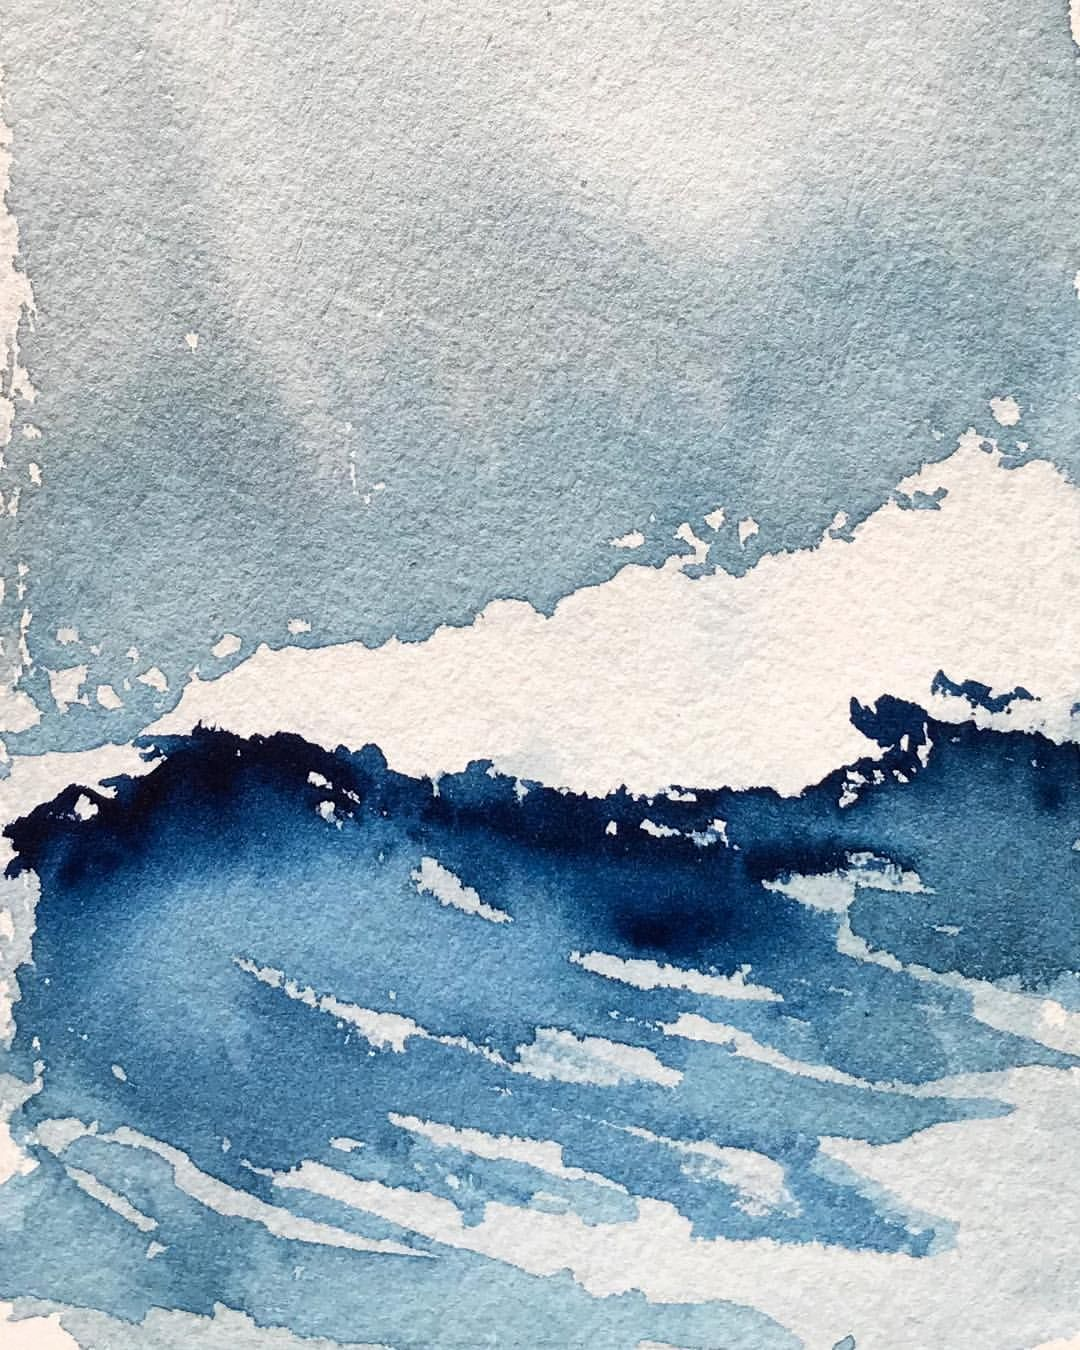 Apprendre L Aquarelle Avec Un Bord De Mer Et Un Ciel Orageux